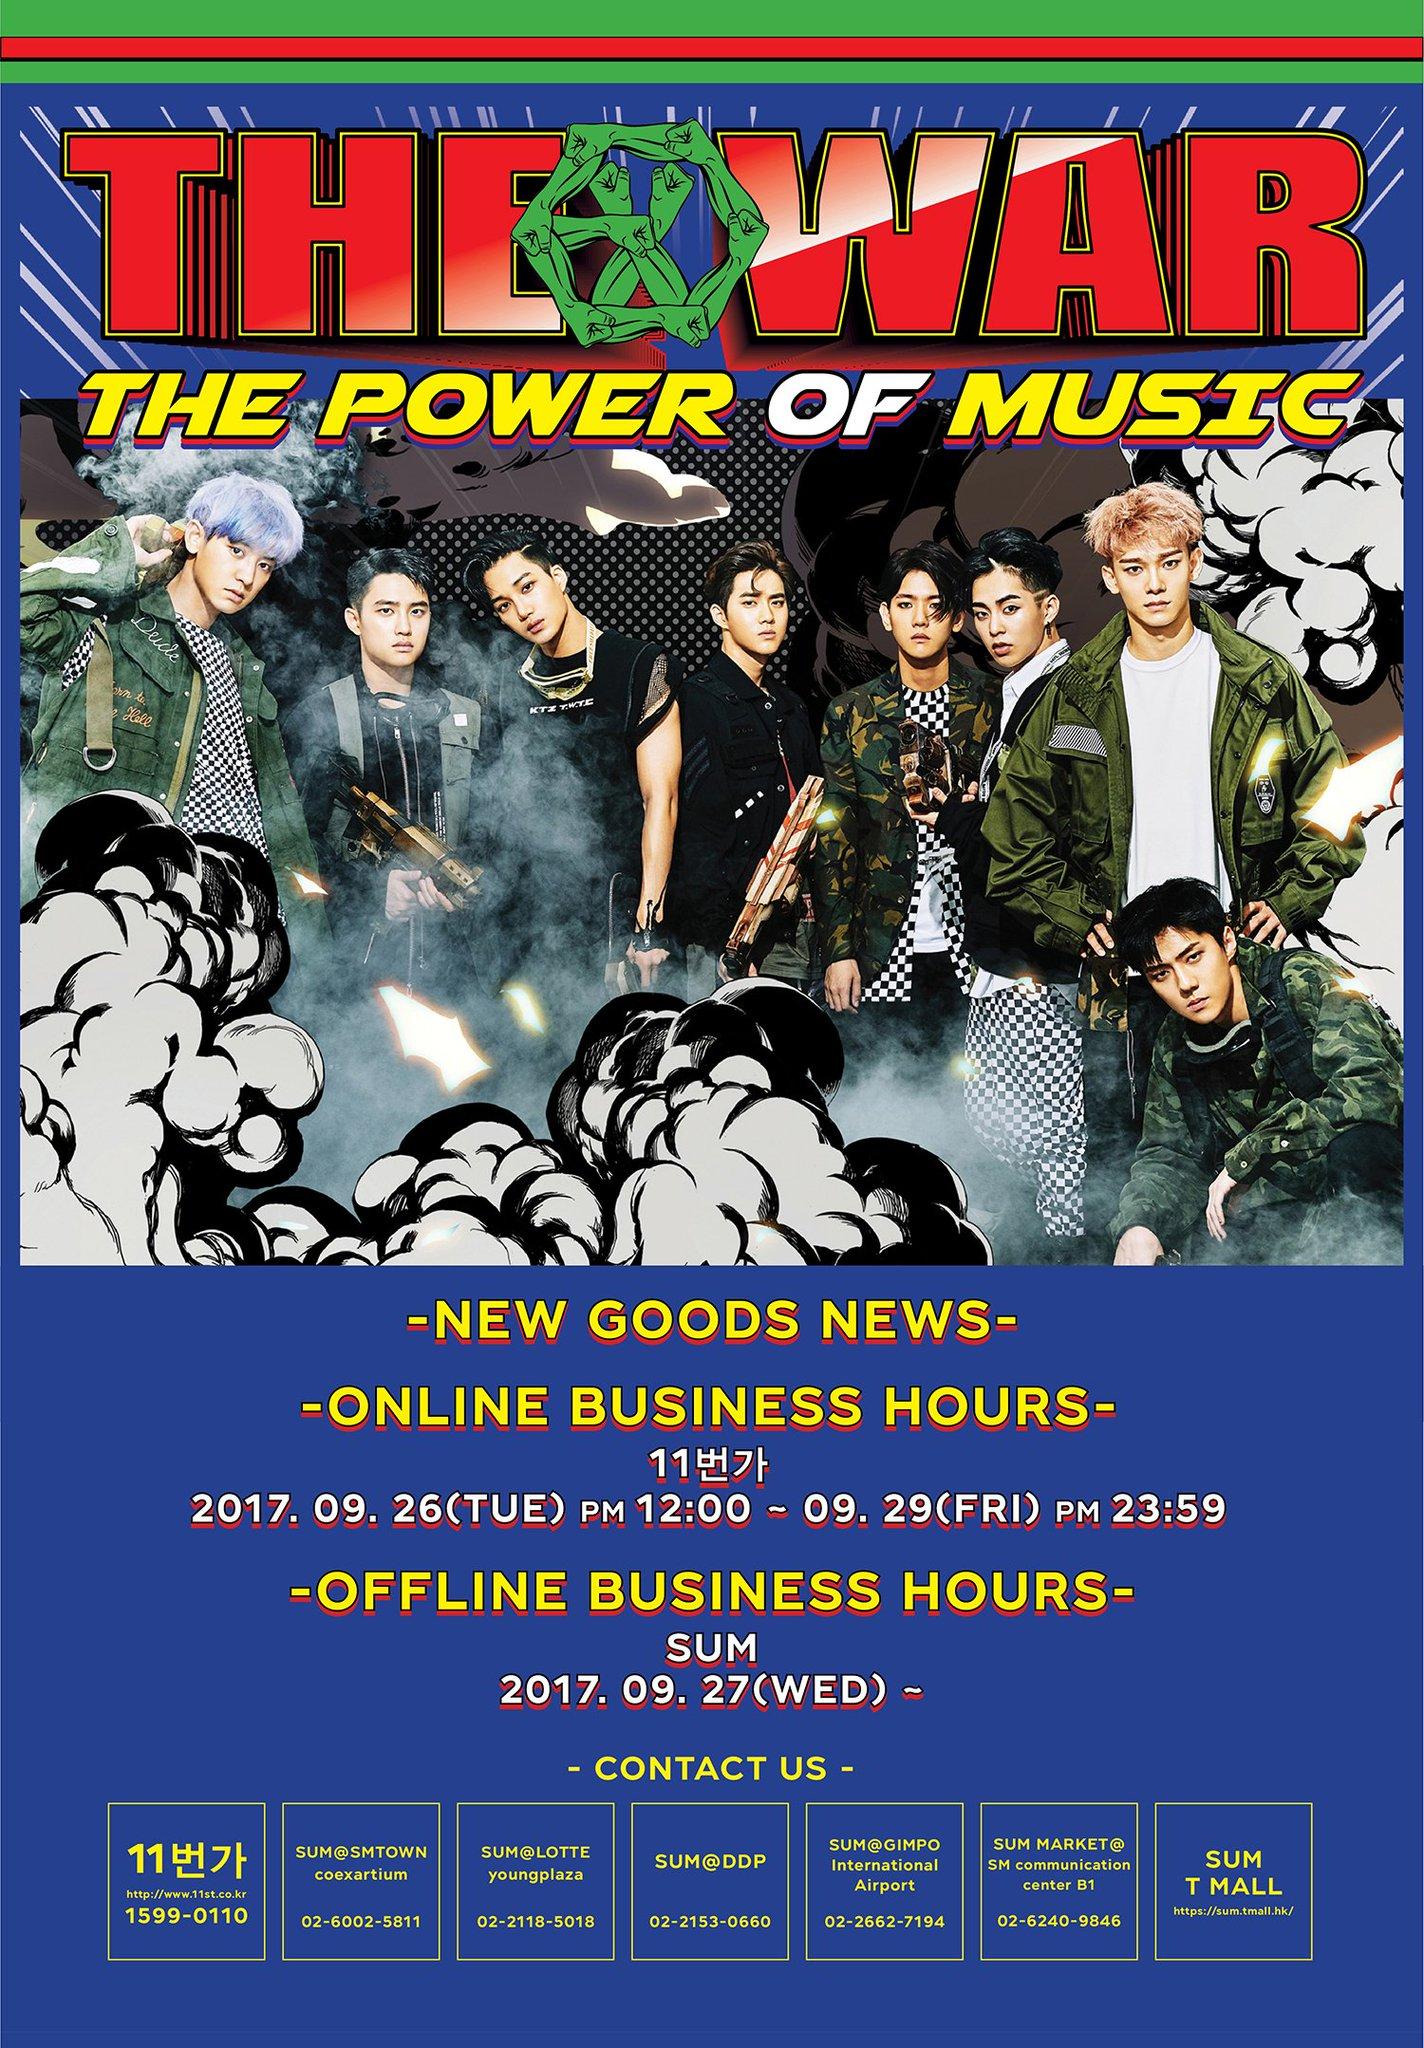 #EXO '#TheWar: #ThePowerofMusic' New Goods 온/오프라인 판매 안내 LENTICULAR��https://t.co/CasVh5v7p0 https://t.co/ZfWlL0nu0R